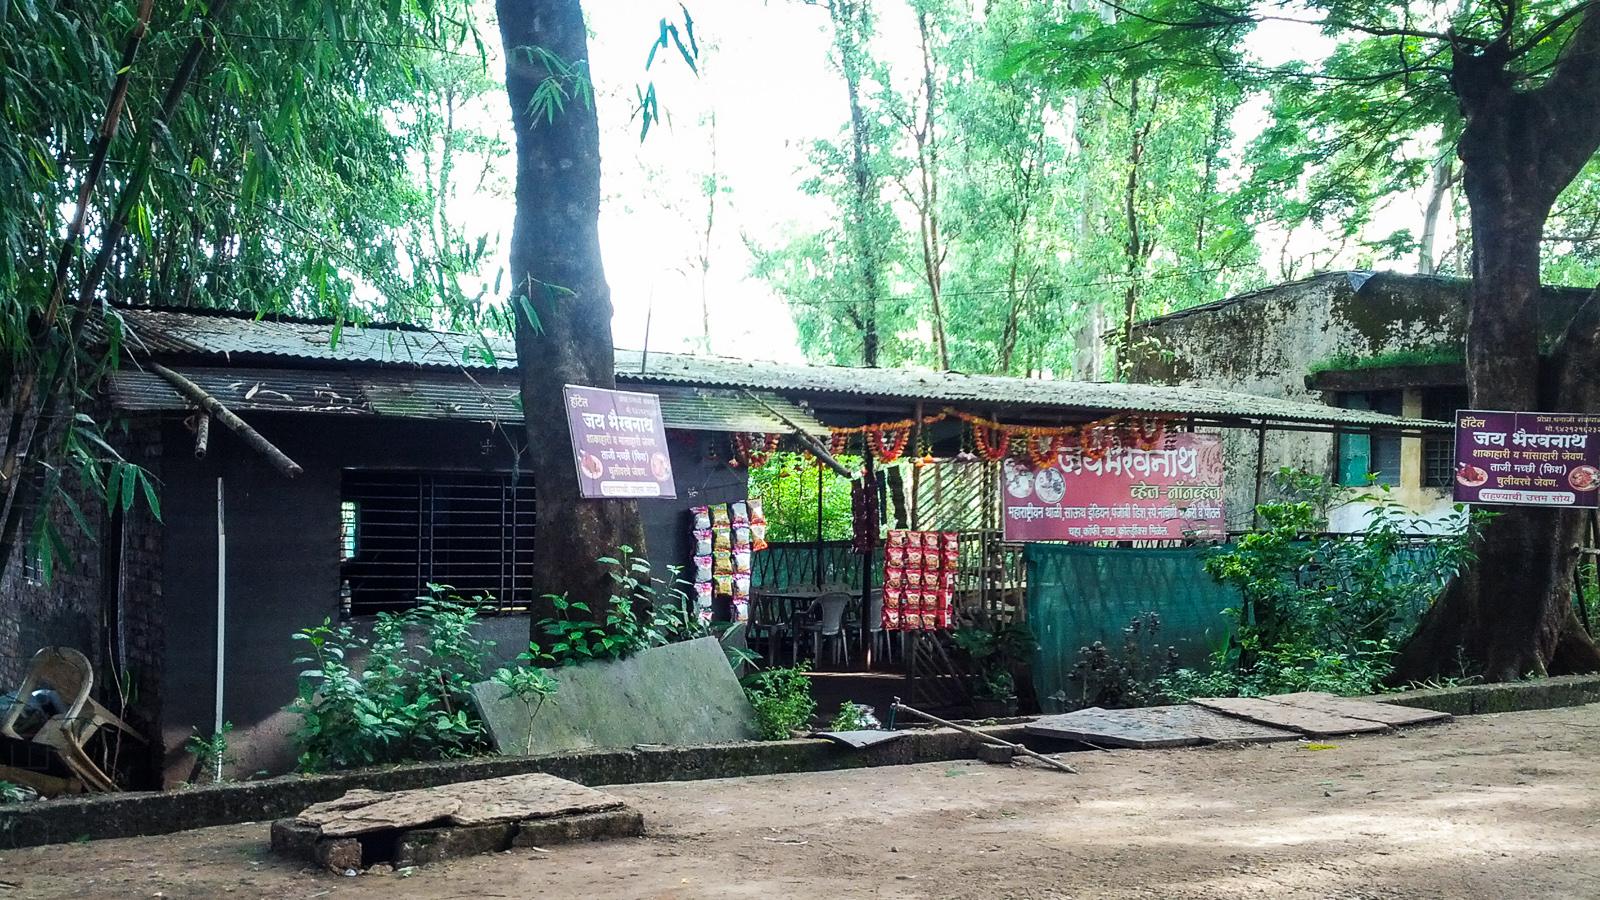 The local chaiwalla at Bamnoli